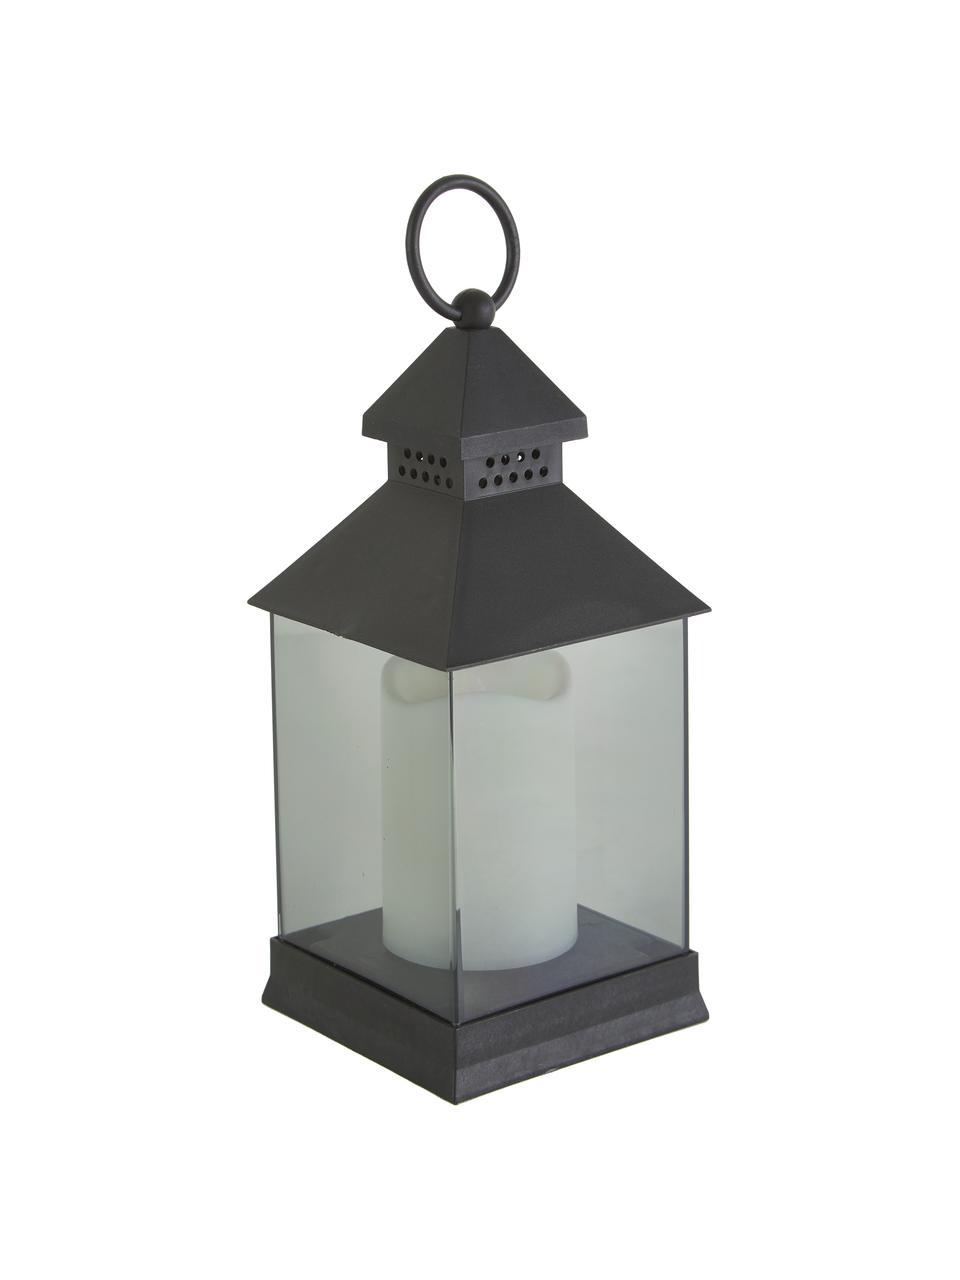 Lanterna portatile con candela a LED Flam 6 pz, Struttura: materiale sintetico, Paralume: acrilico, Nero, Larg. 10 x Alt. 25 cm